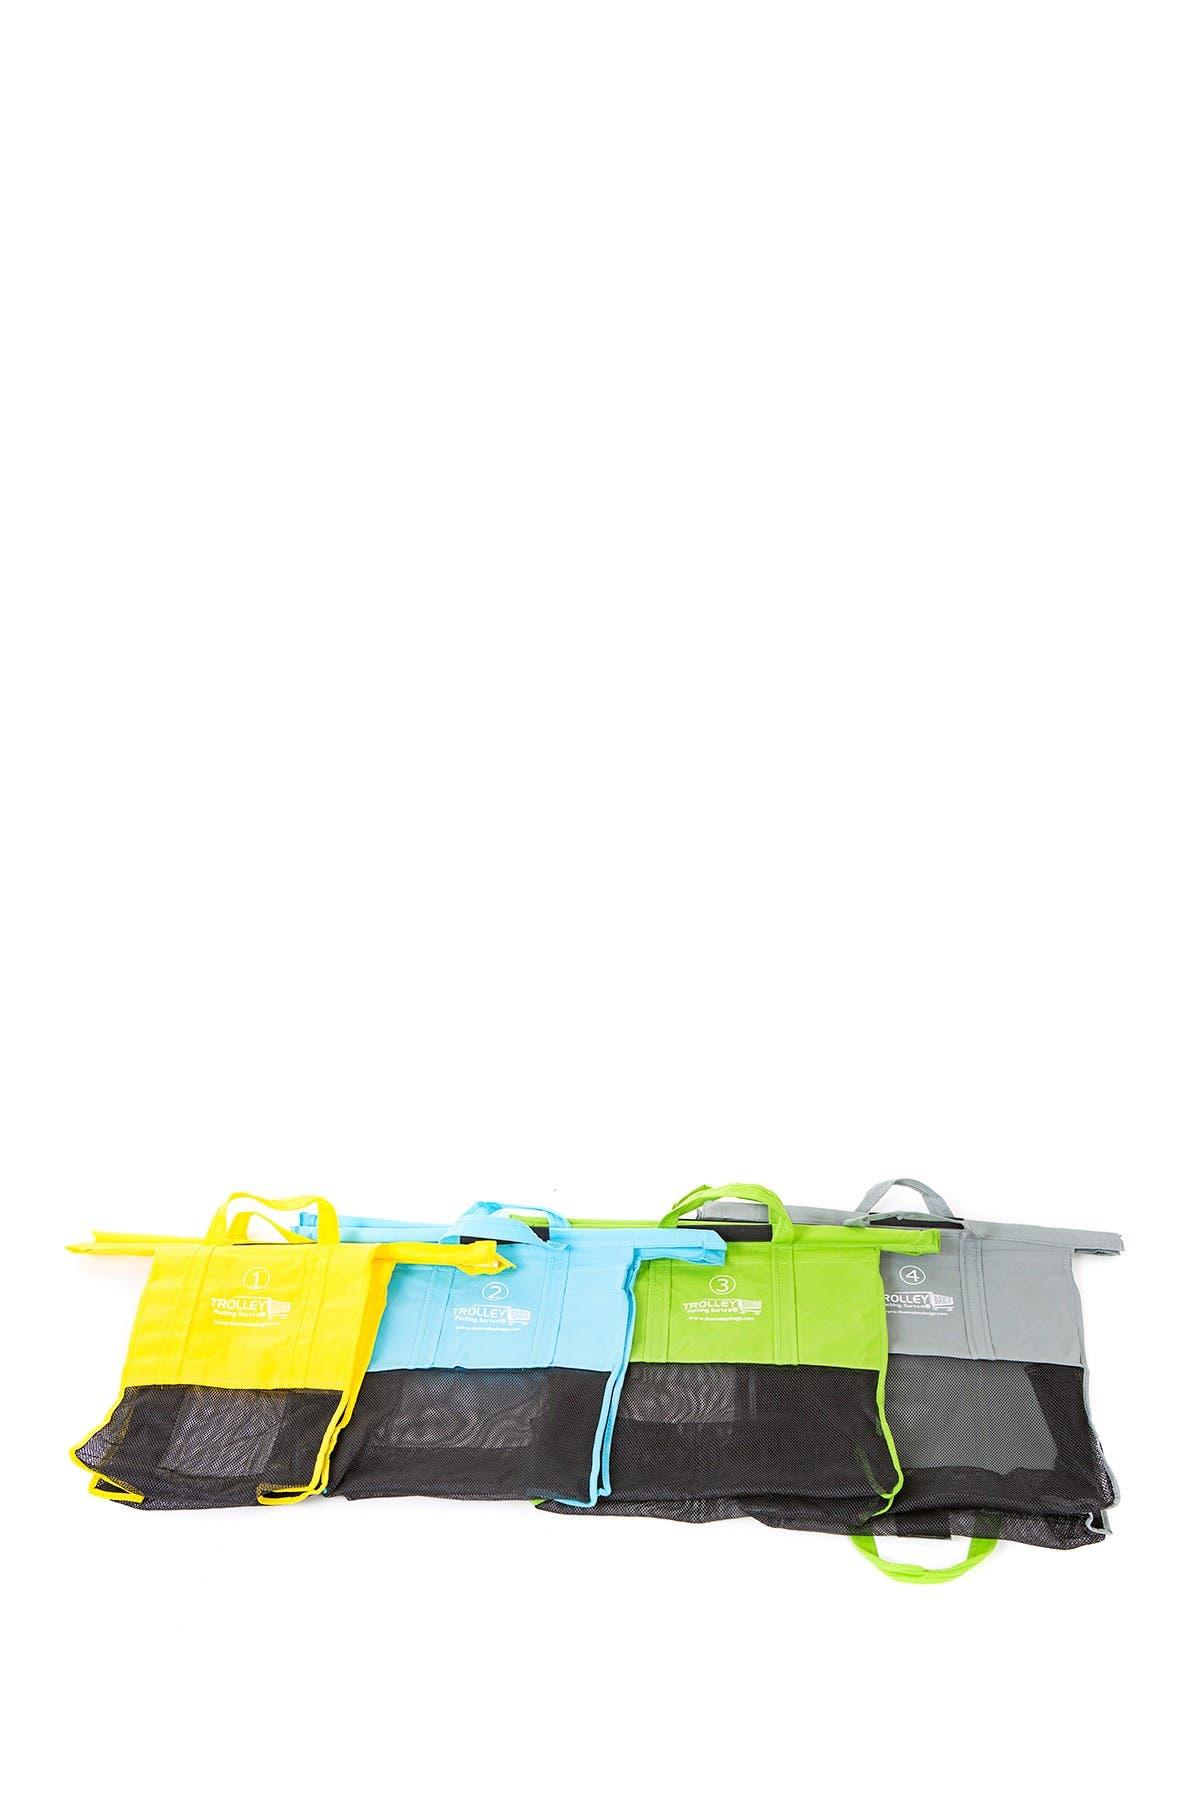 Image of BergHOFF Multi Original Pastel Trolley Bags - Set of 4